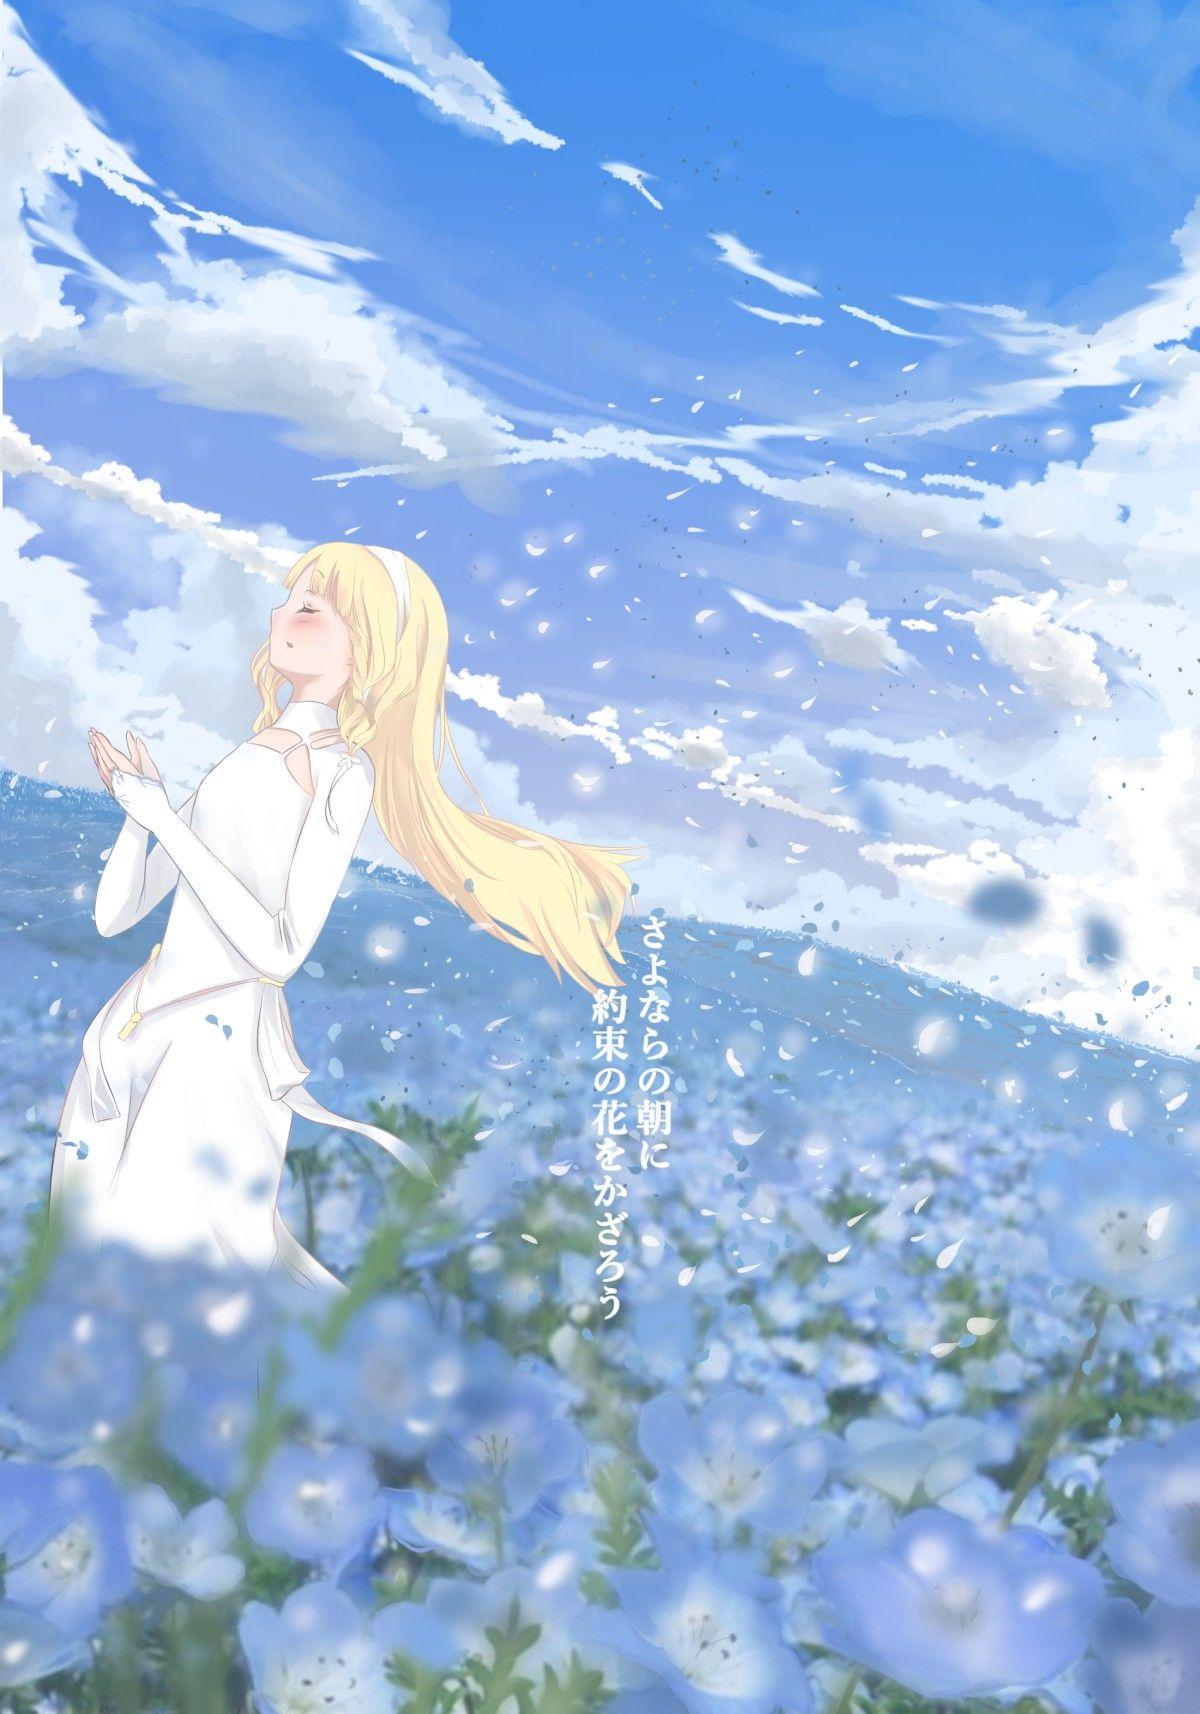 21 Best さよならの朝に約束の花をかざろう Images Anime Anime Art